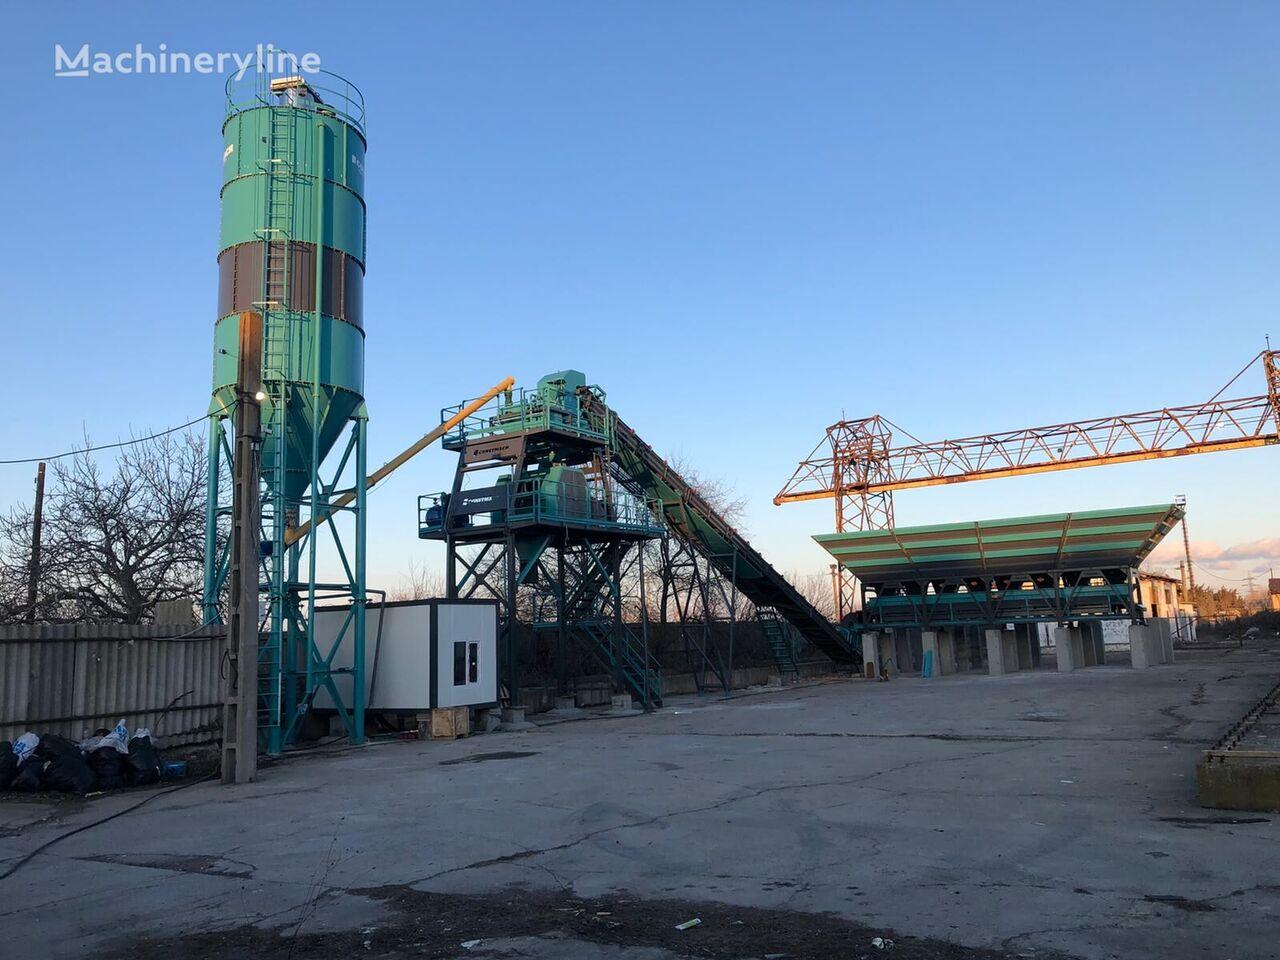 новый бетонный завод CONSTMACH 60 m3 Concrete Batching Plant For Sale Best Price